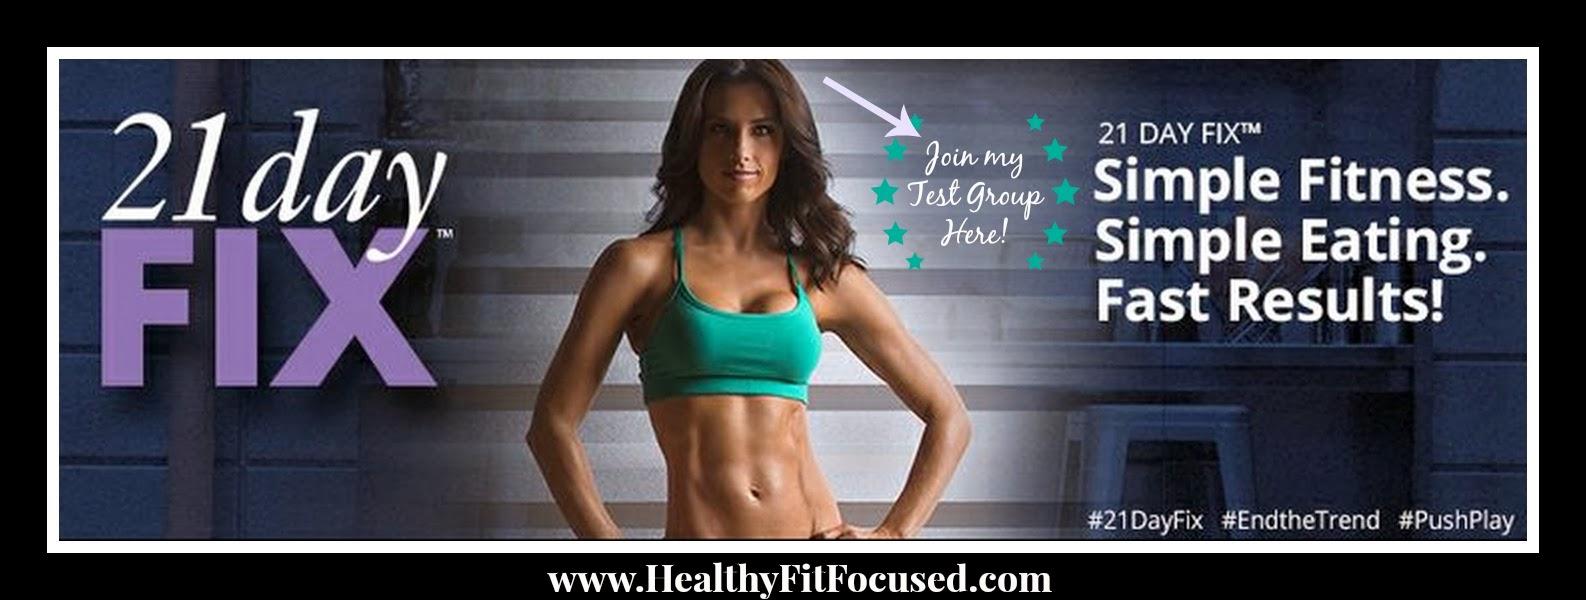 21 Day Fix, 21 Day Fix Menu, www.HealthyFitFocused.com